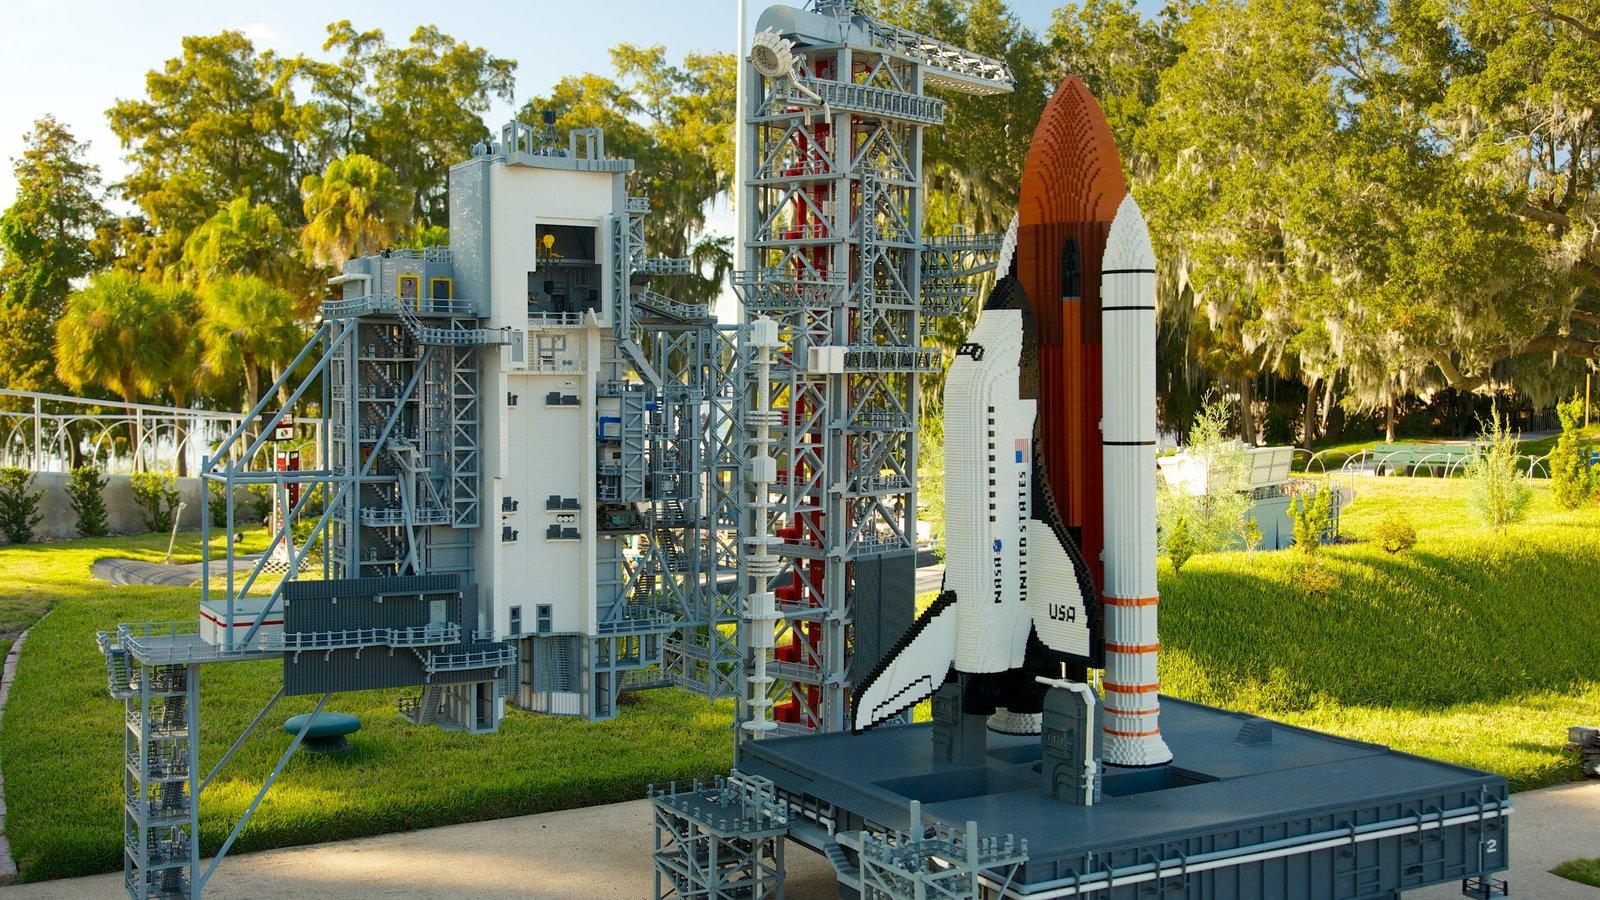 Legoland Florida featuring a park and rides